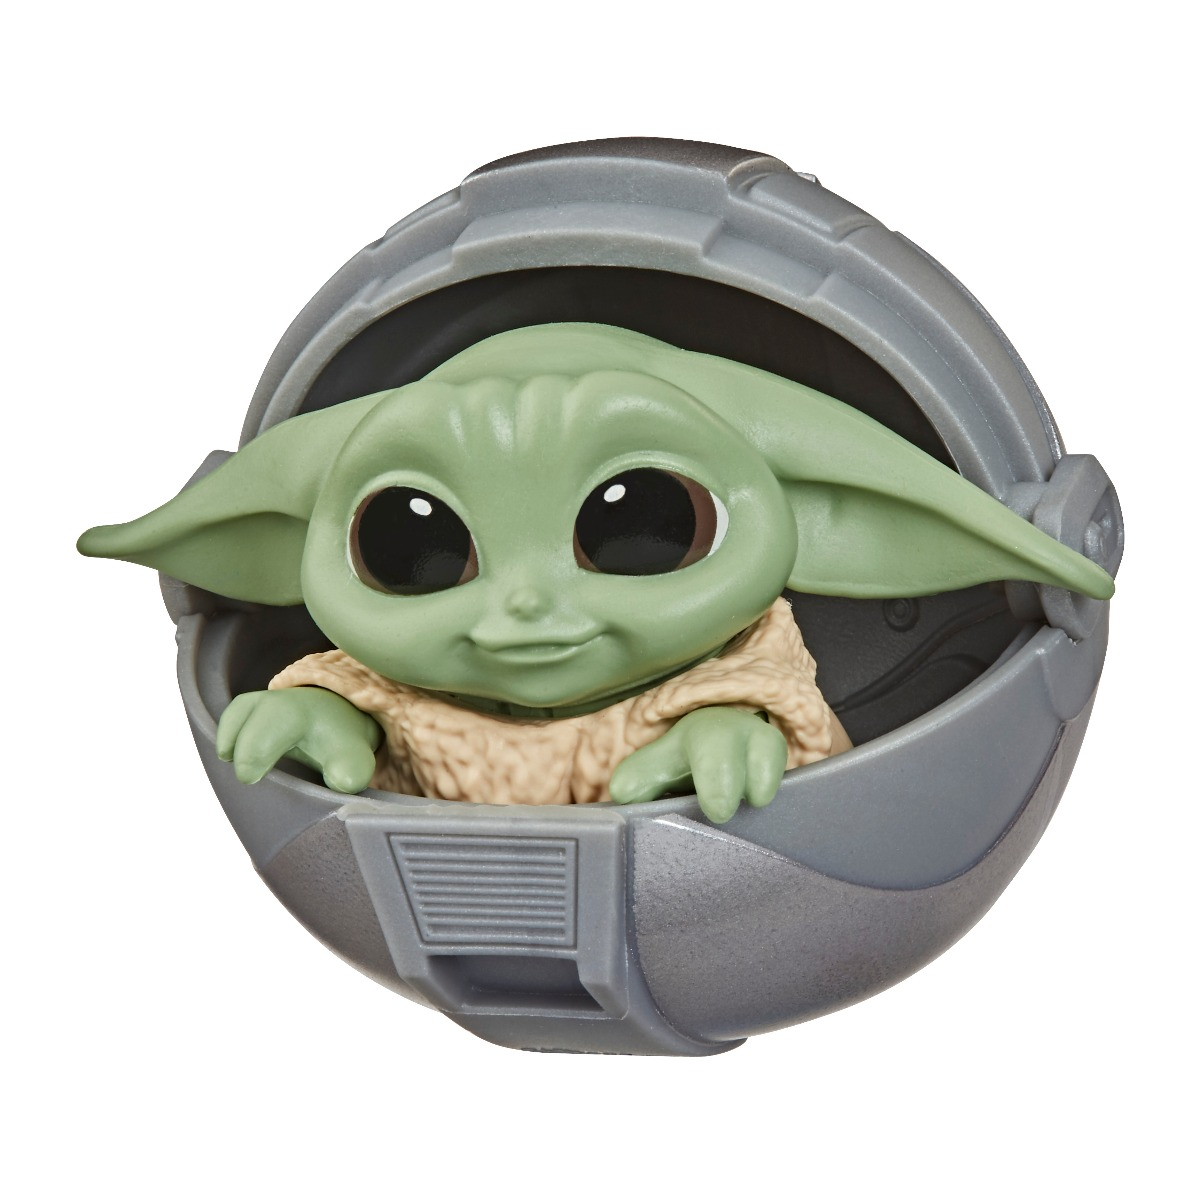 Figurina Star Wars Baby Yoda, Crib, F14815L00, 6 cm